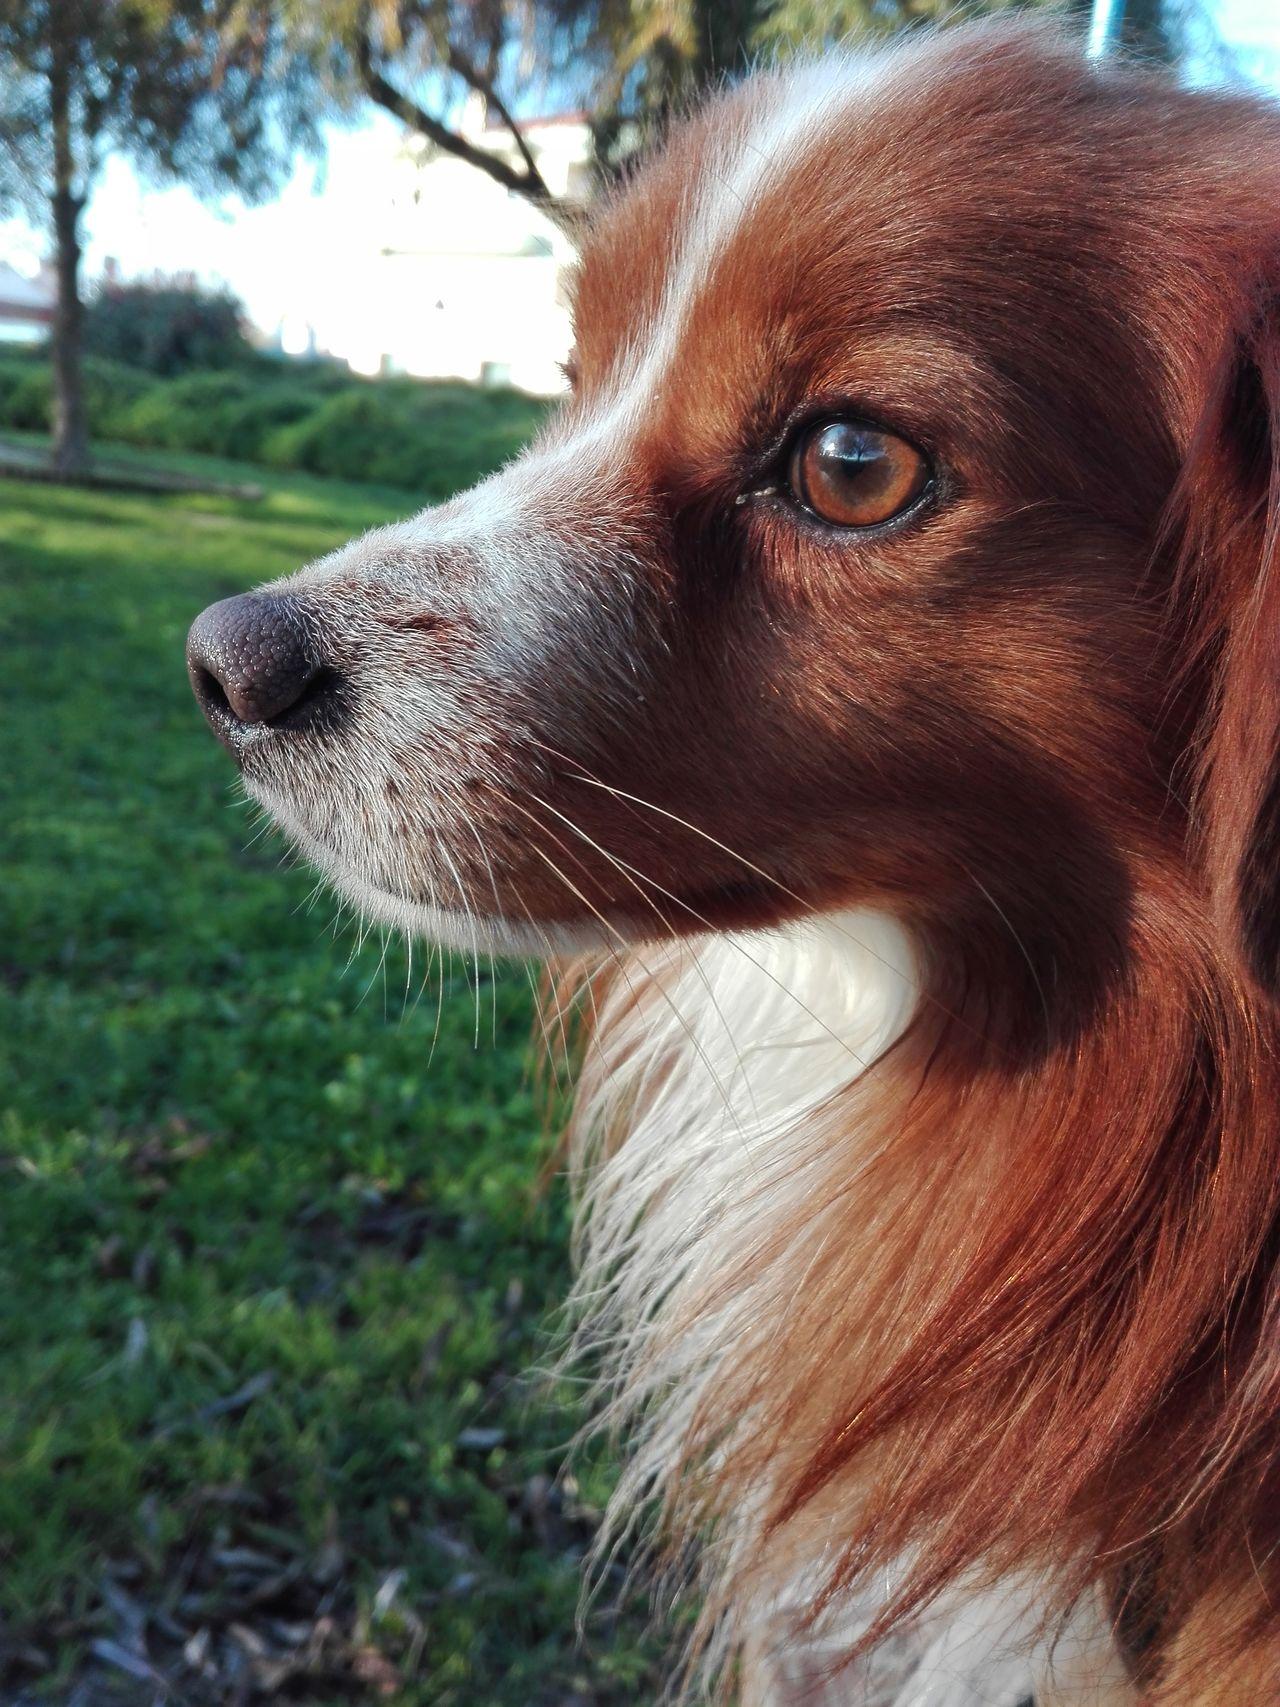 One Animal Animal Themes Nature DogLove Doggy Love Dogoftheday Dogs Of EyeEm Dog❤ No People Dog Life Close-up Mammal Dog Collection Rex Dog Pets Domestic Animals Man Bestfriend